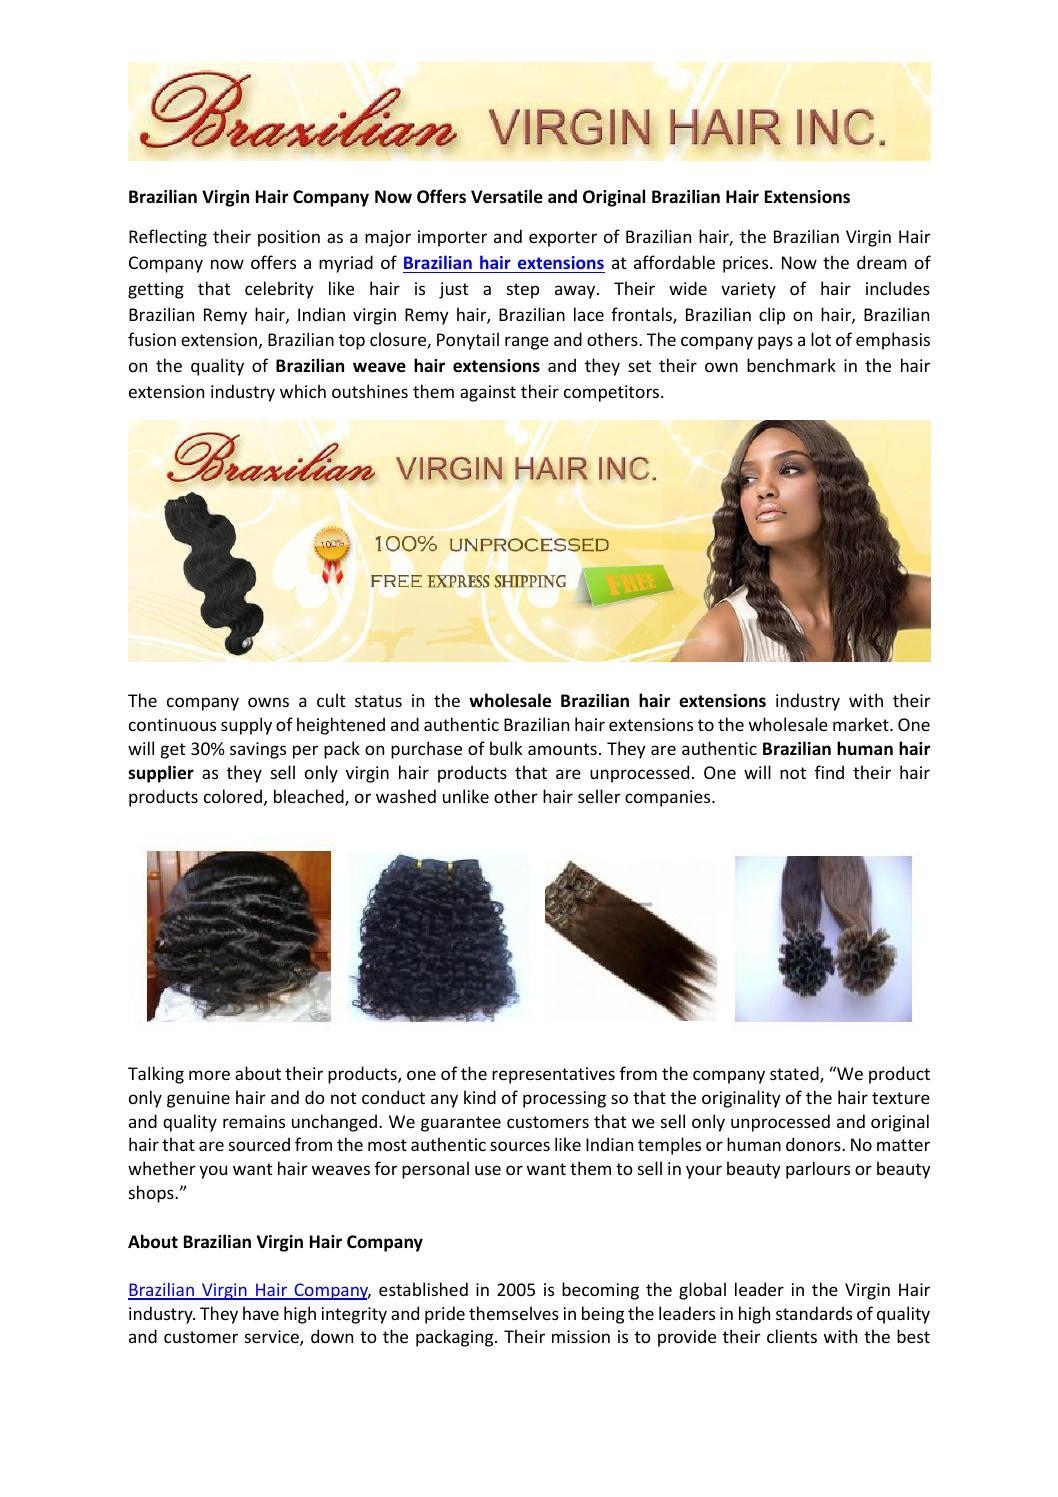 Brazilian Virgin Hair Company Now Offers Versatile And Original